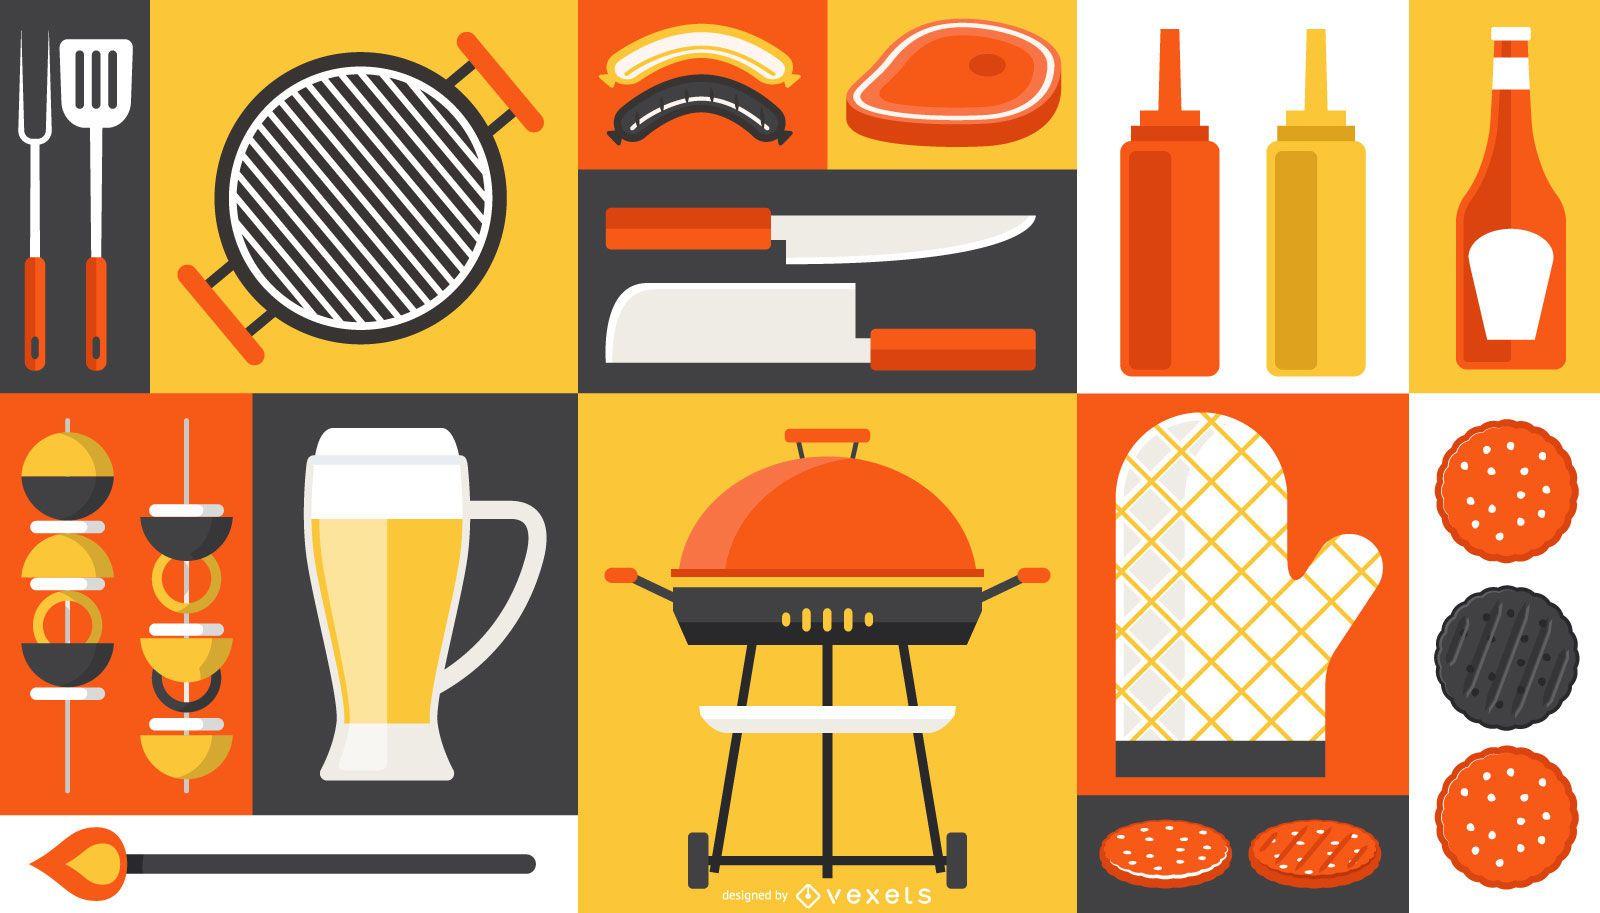 Barbecue Elements Composition Design